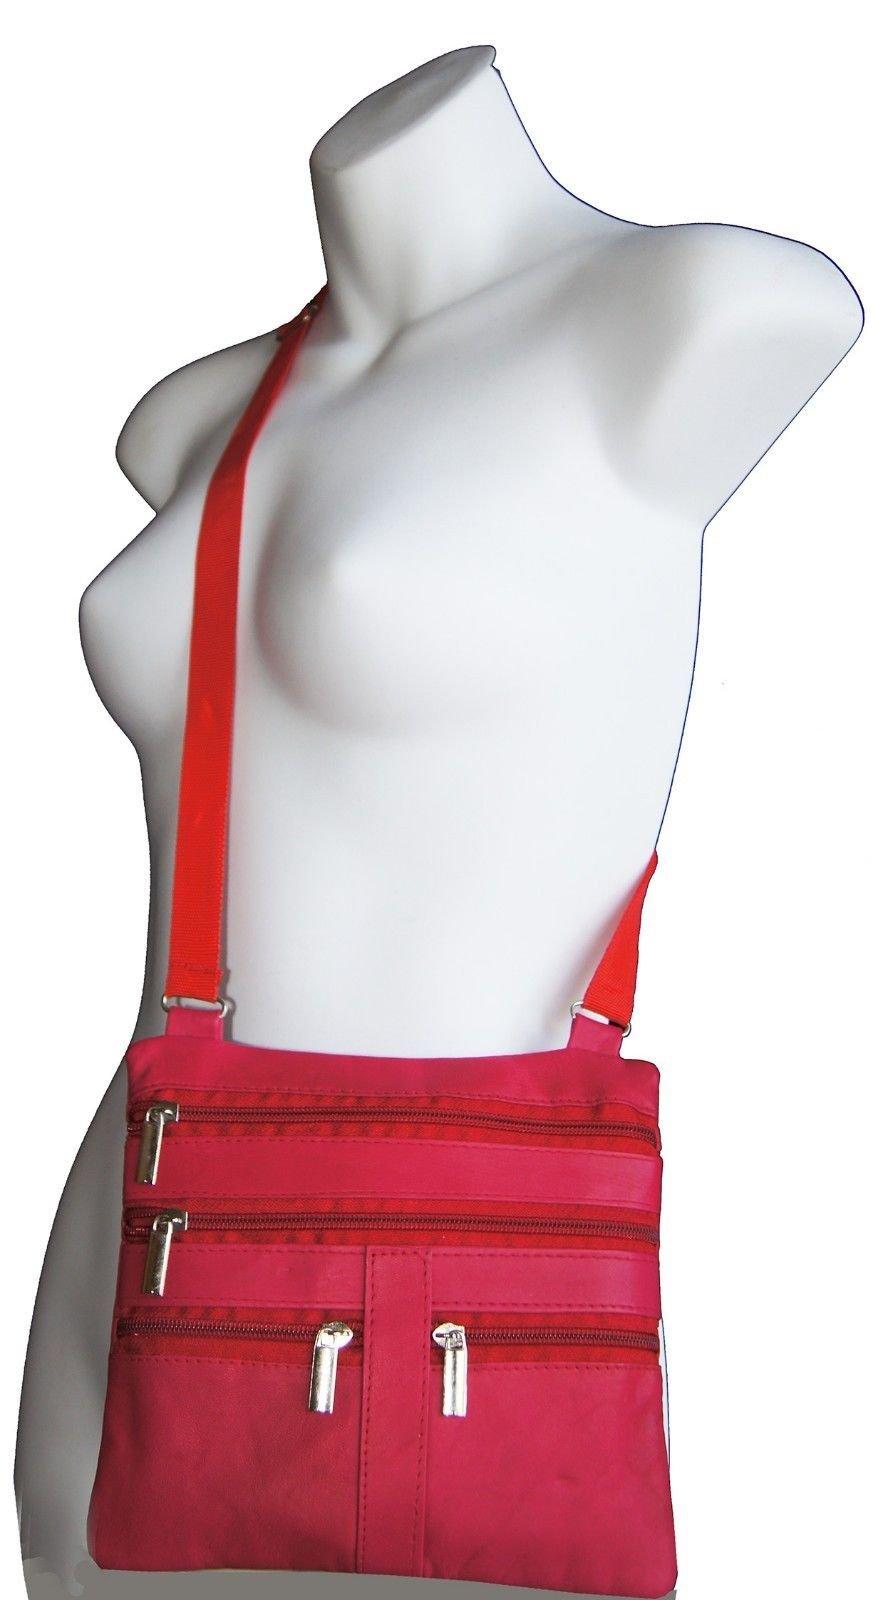 Pink Ladies Genuine Leather Cross Body Bag Satchel Messenger Bag 48'' Strap by Wallet (Image #2)